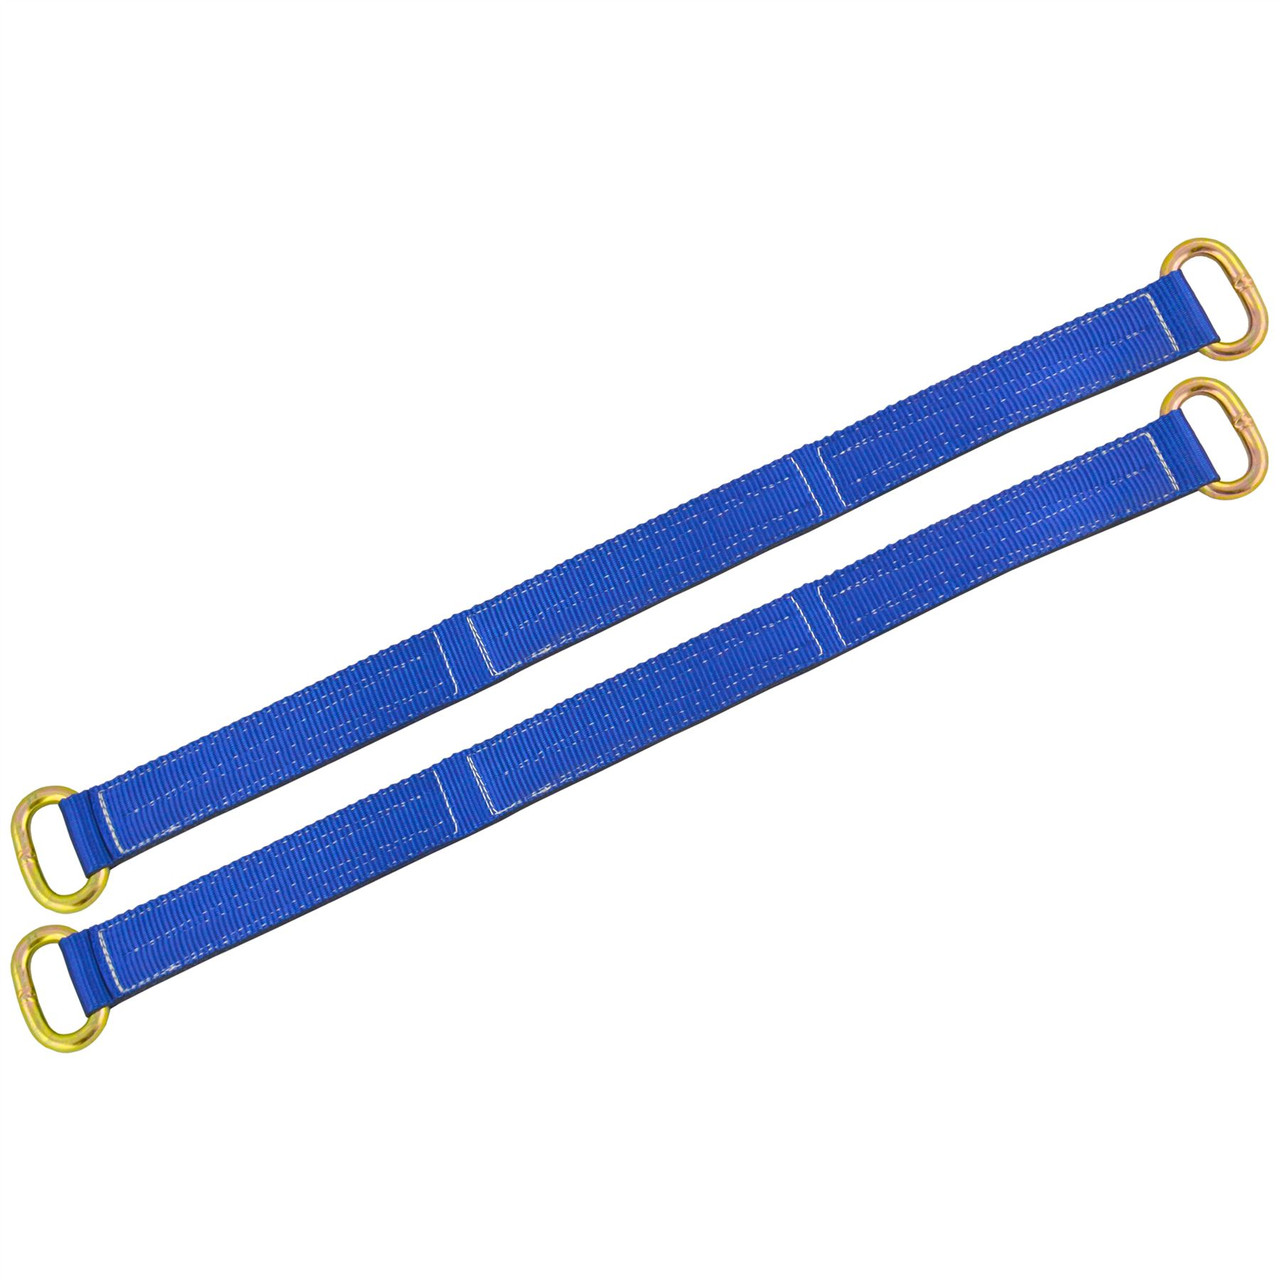 "Wheel Bridging / Link / Strap (pair) Trailer Tie Down Car Recovery 30"" SM010"